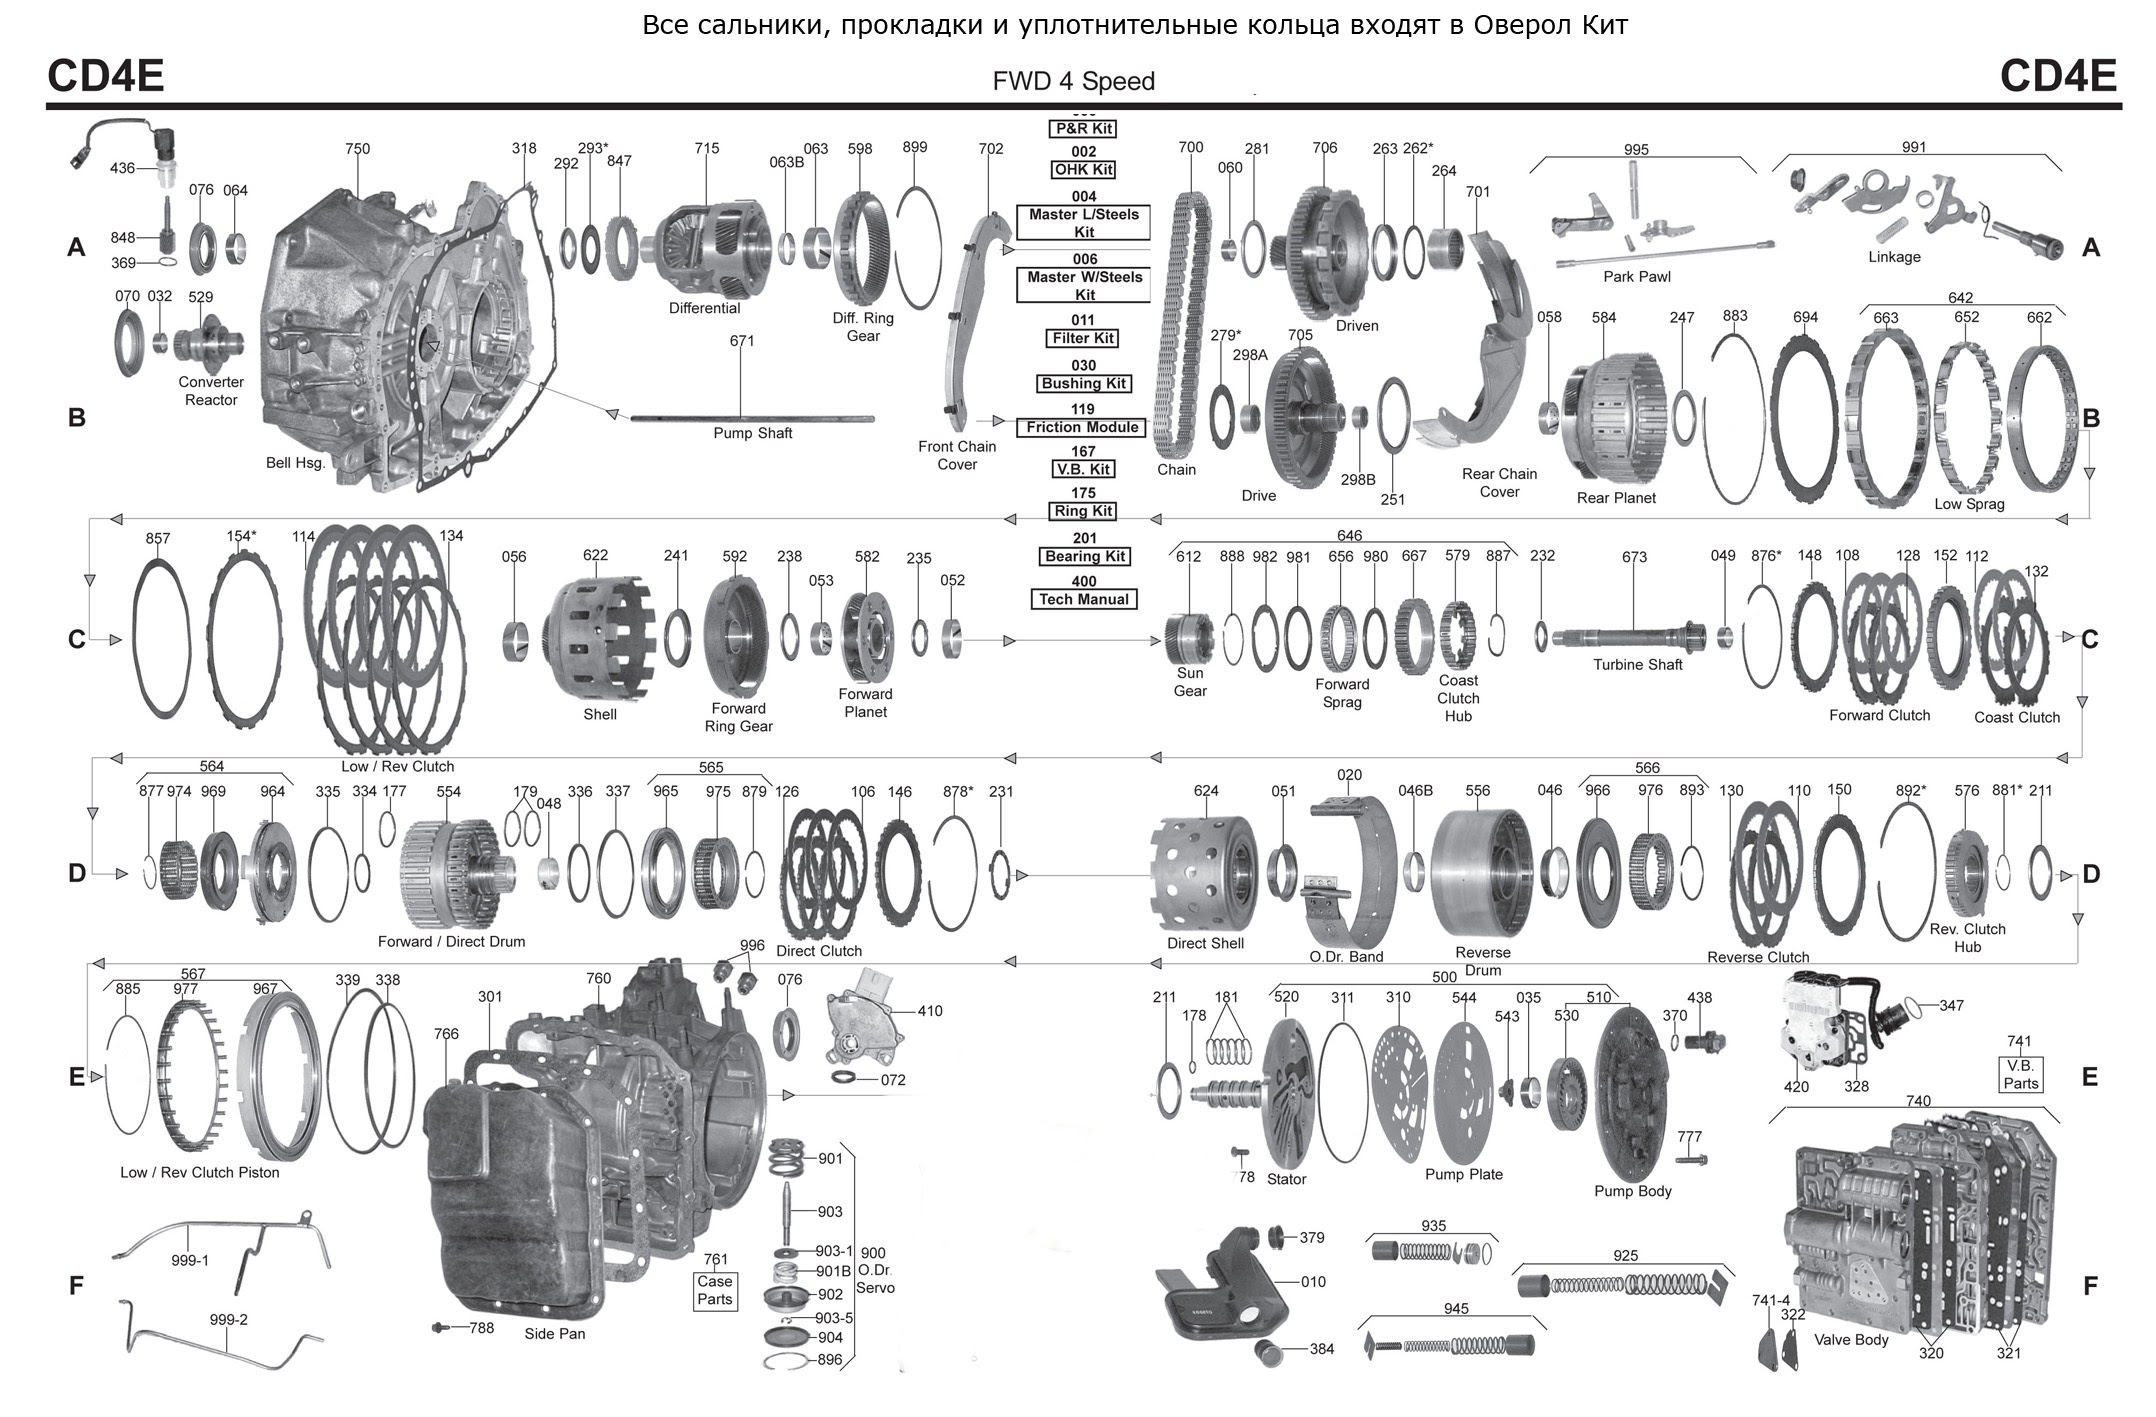 Bestseller: Zf 4hp22 Transmission Service Manual Pdf